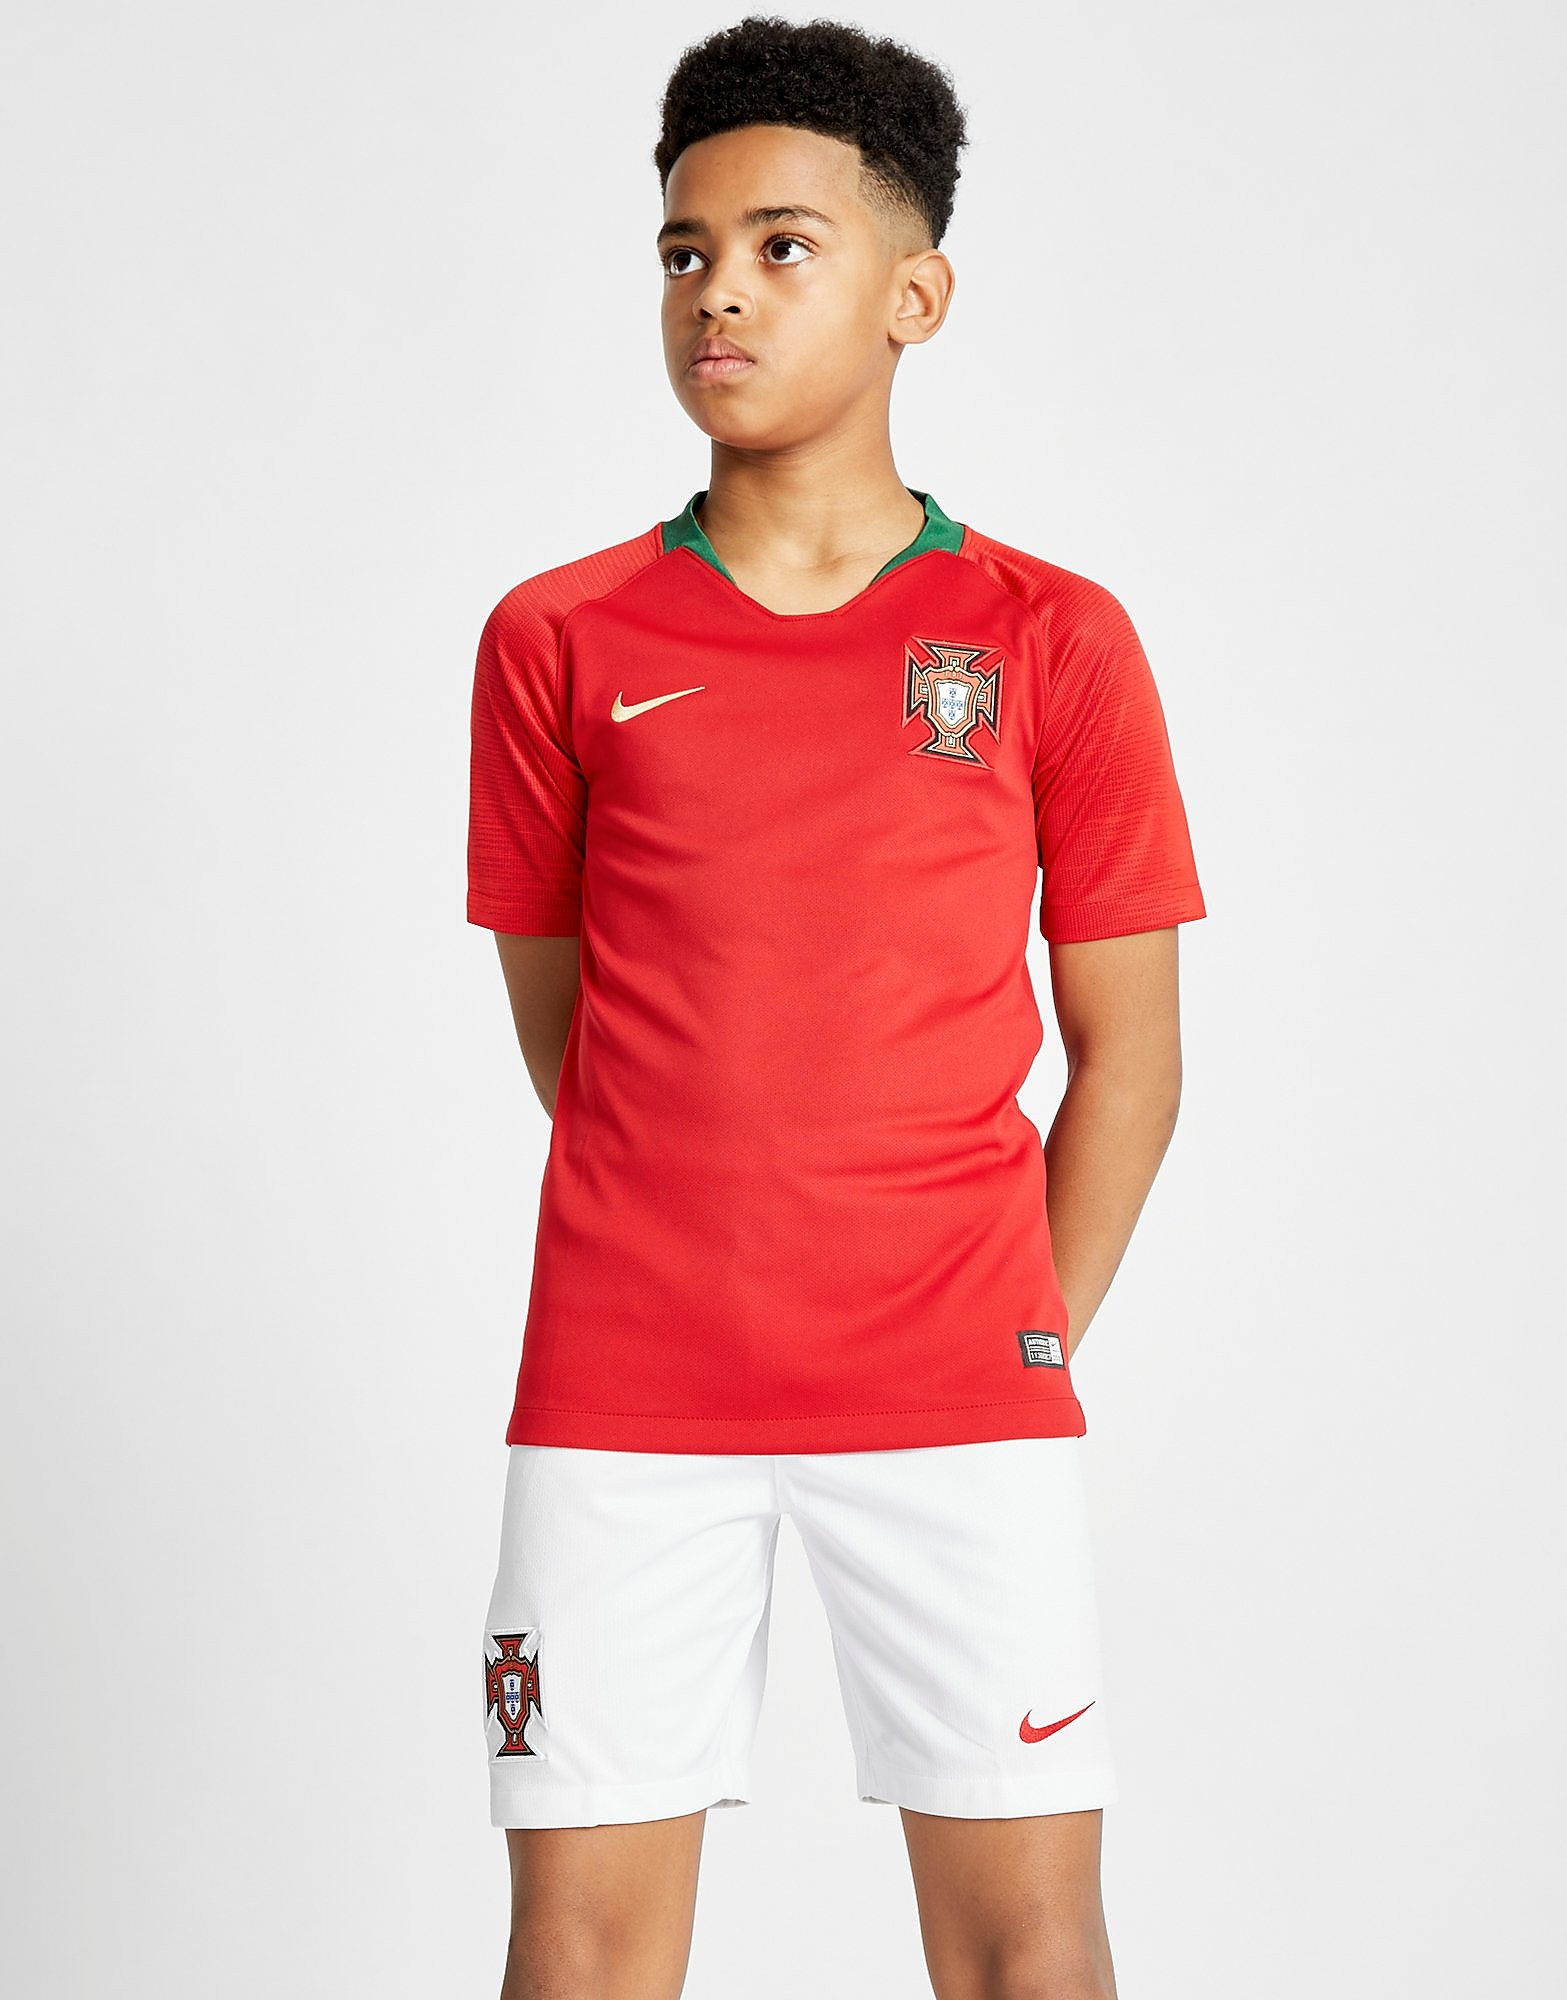 Nike Maillot Domicile Portugal 2018 Homme